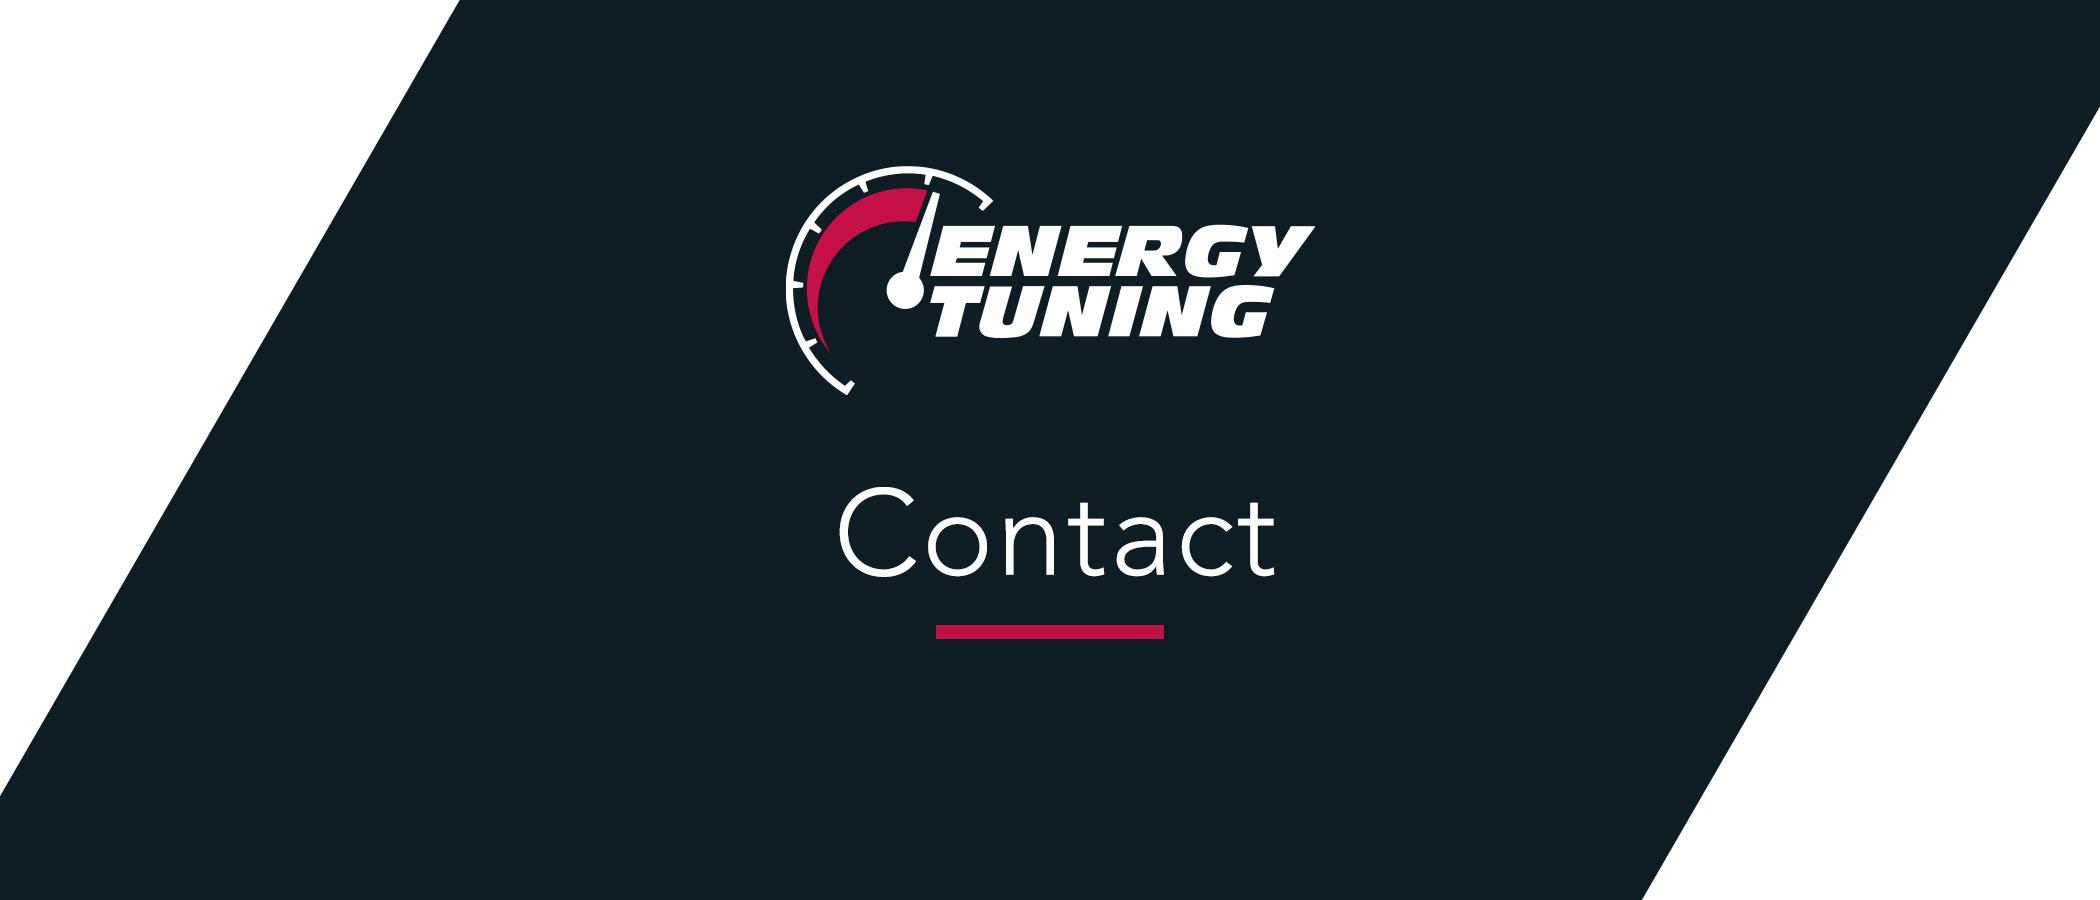 Contact Energy Tuning